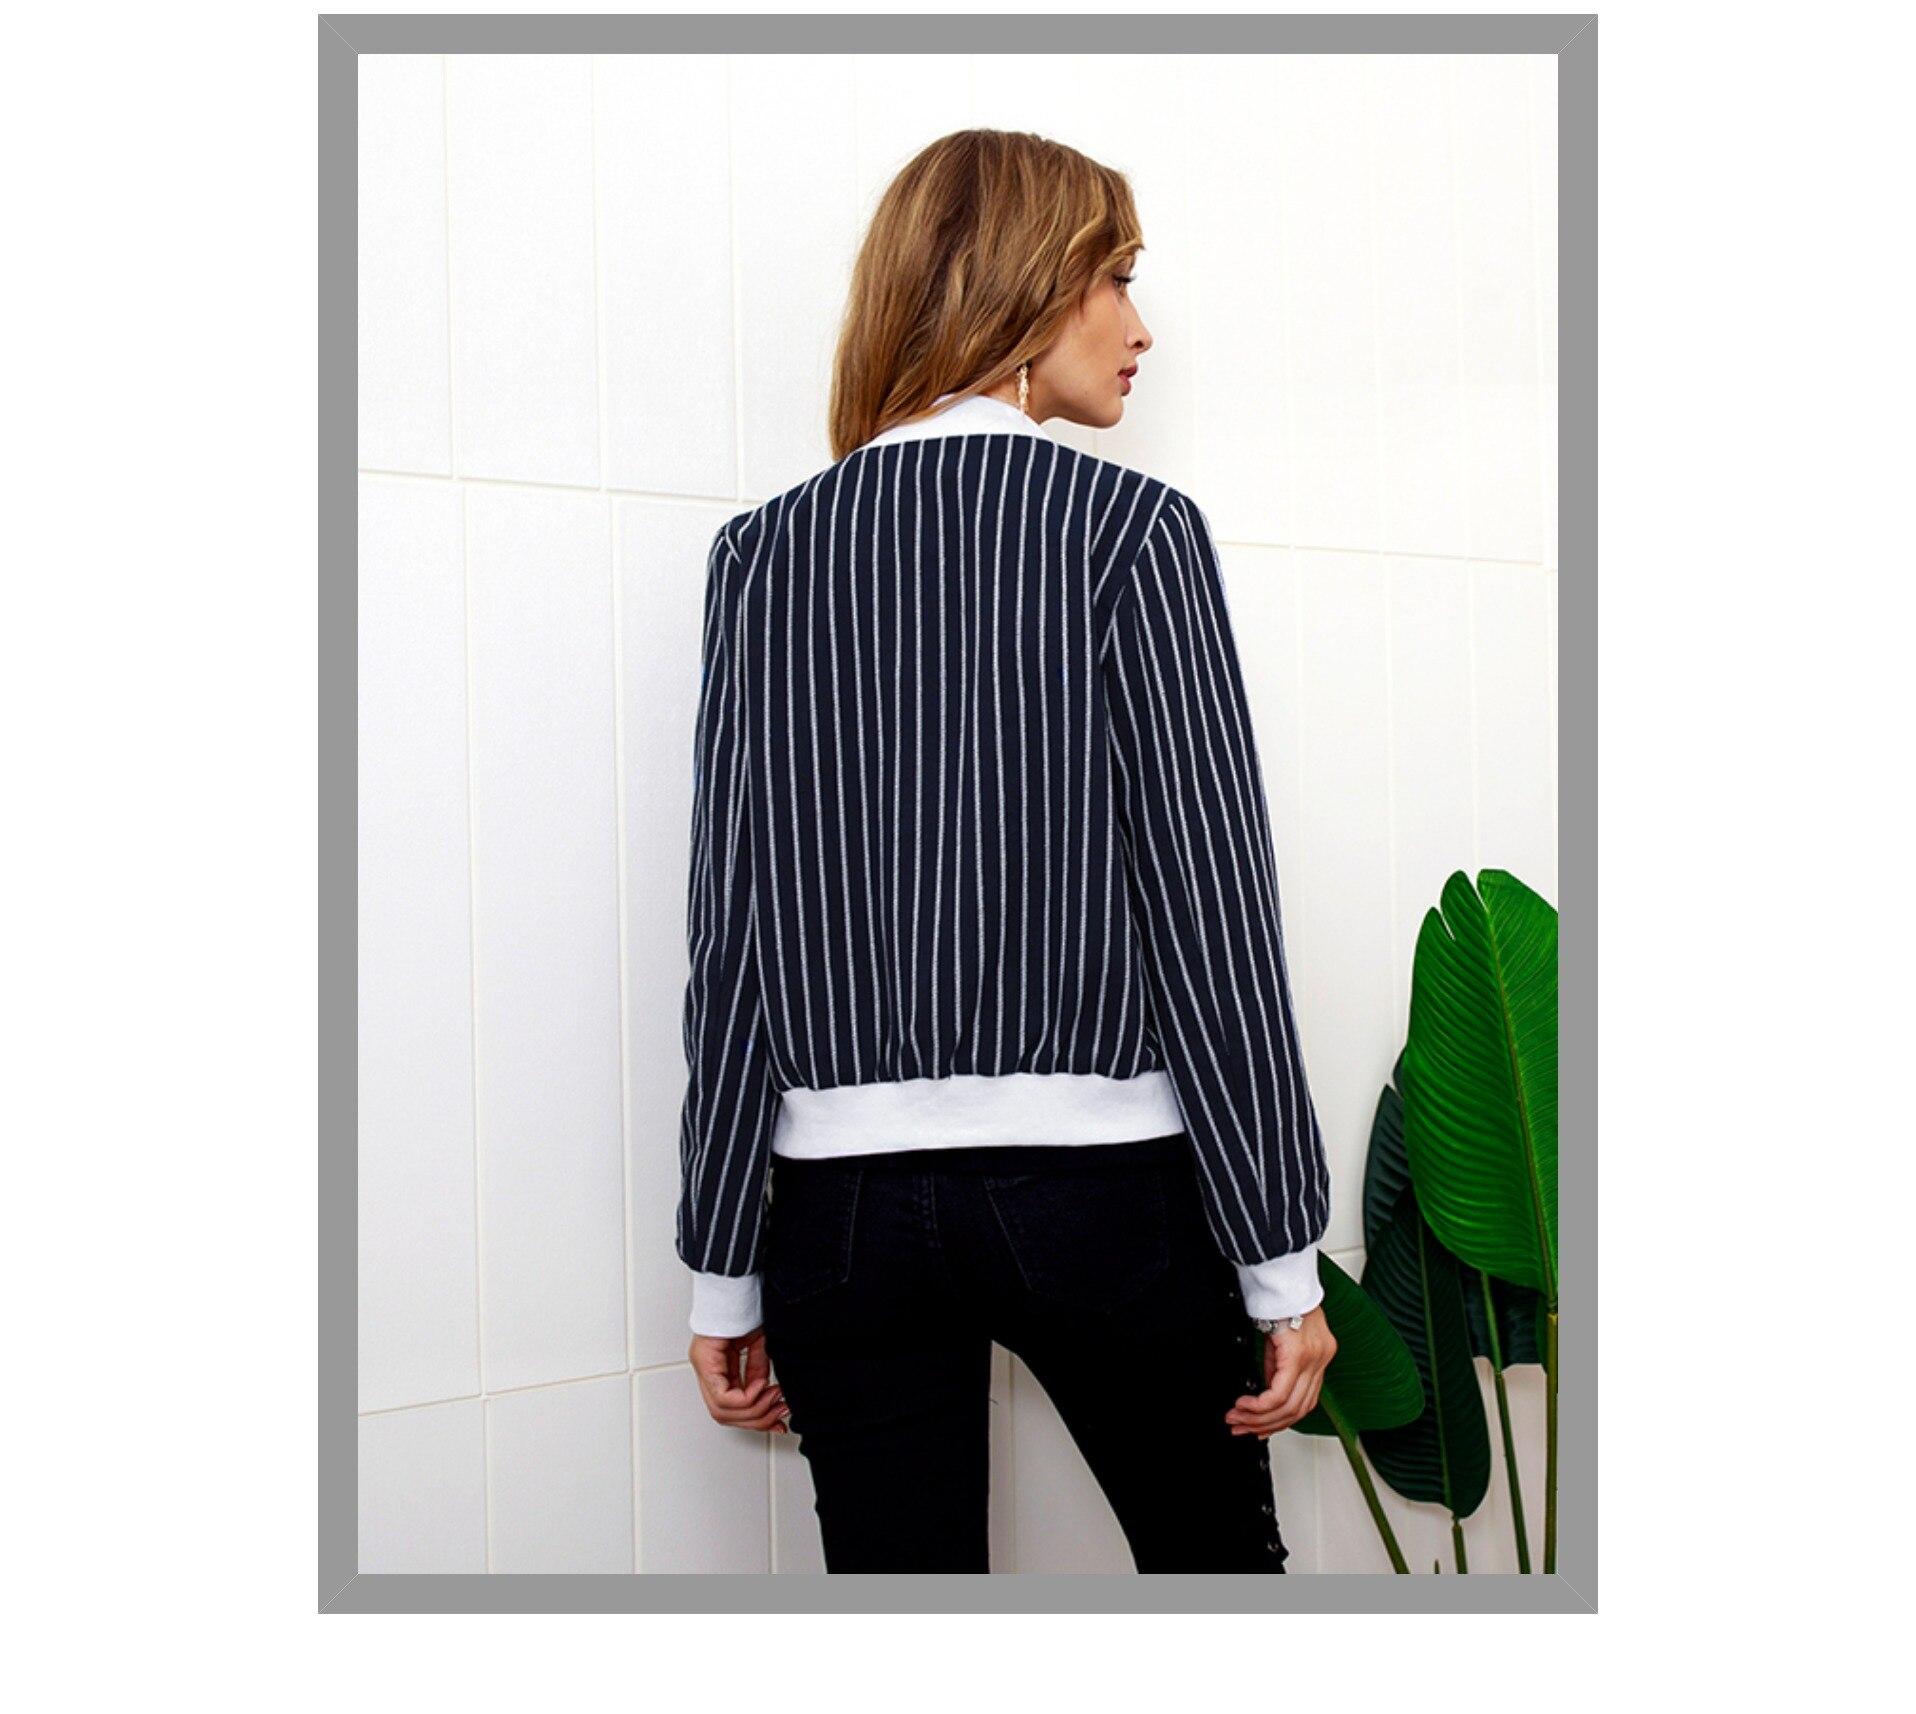 c132ee010 Dicloud Striped Bomber Jacket Women Long Sleeve Women Jacket 2018 Autumn  Basic Coats Casual Slim Outerwear Short Jackets Womans